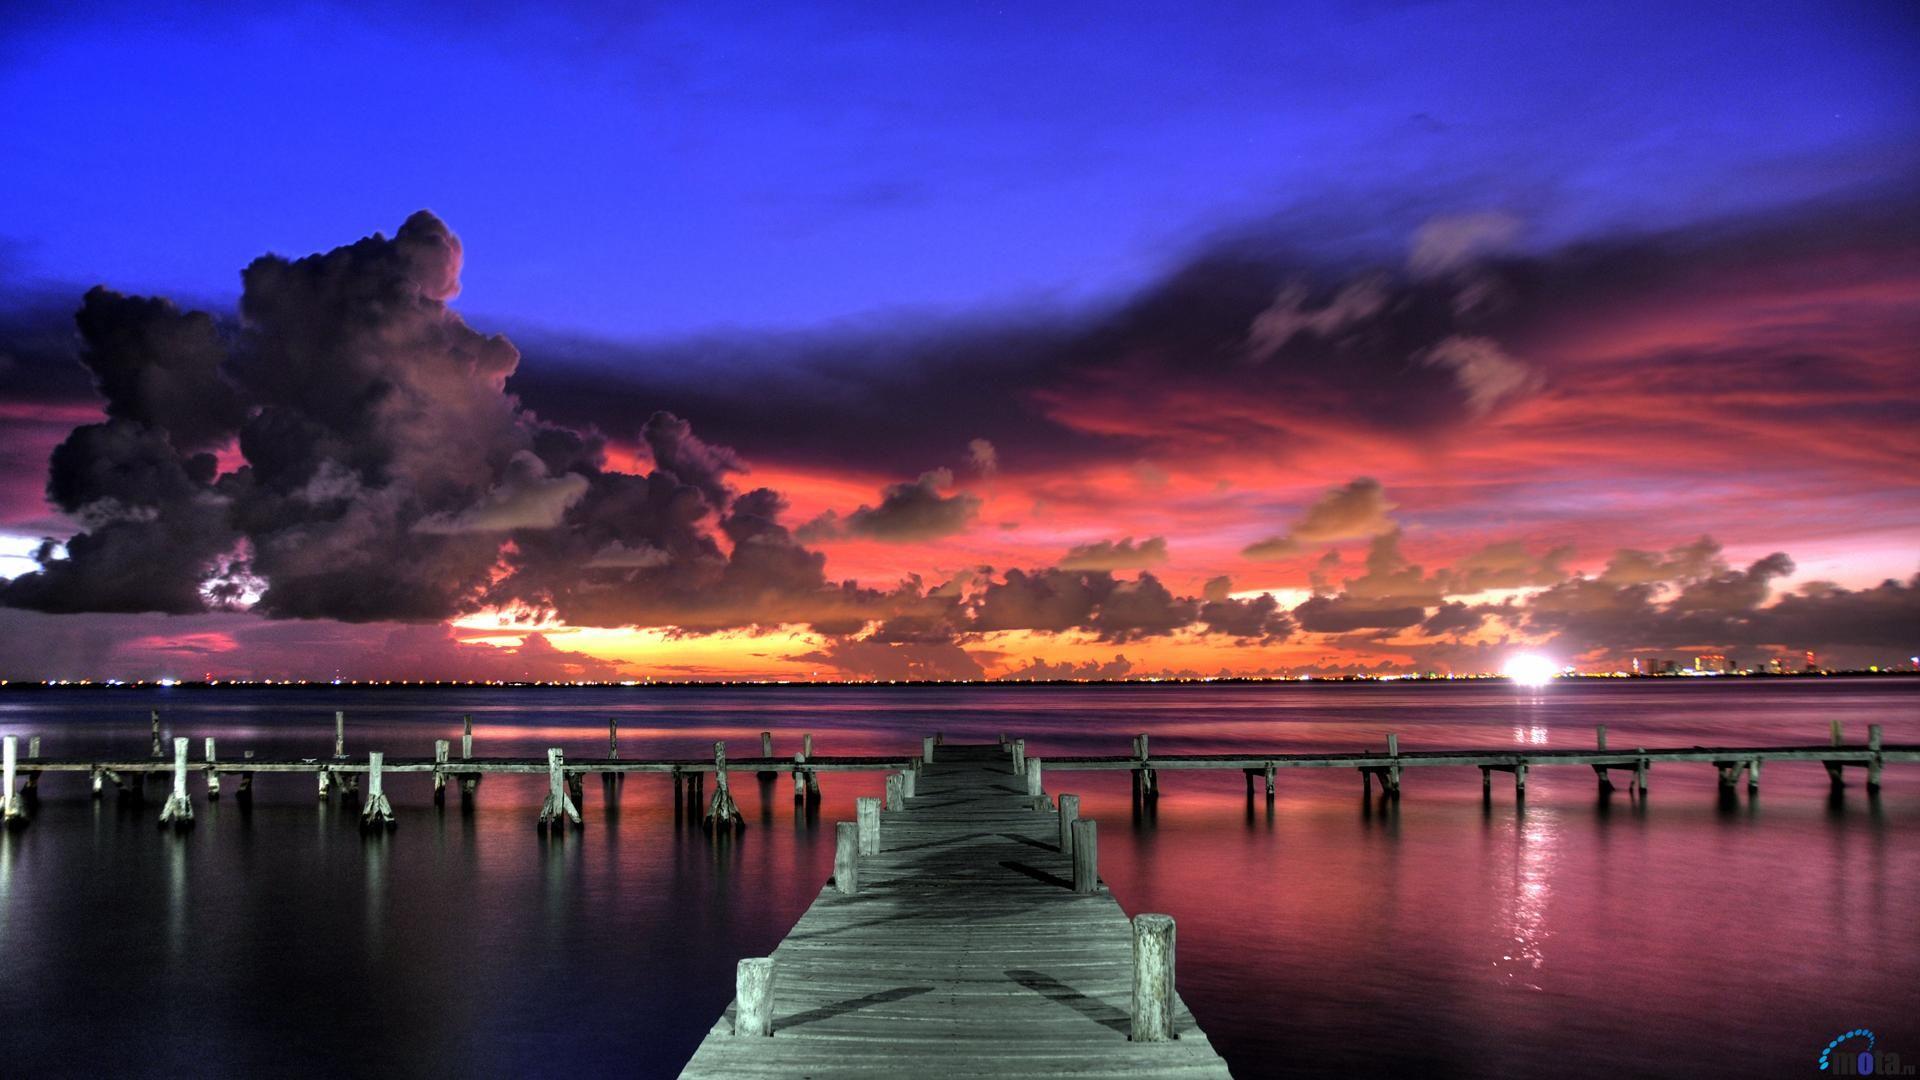 beautiful tropical sunset wallpaper free desktop backgrounds and 1600a—1200 tropical sunset wallpapers 37